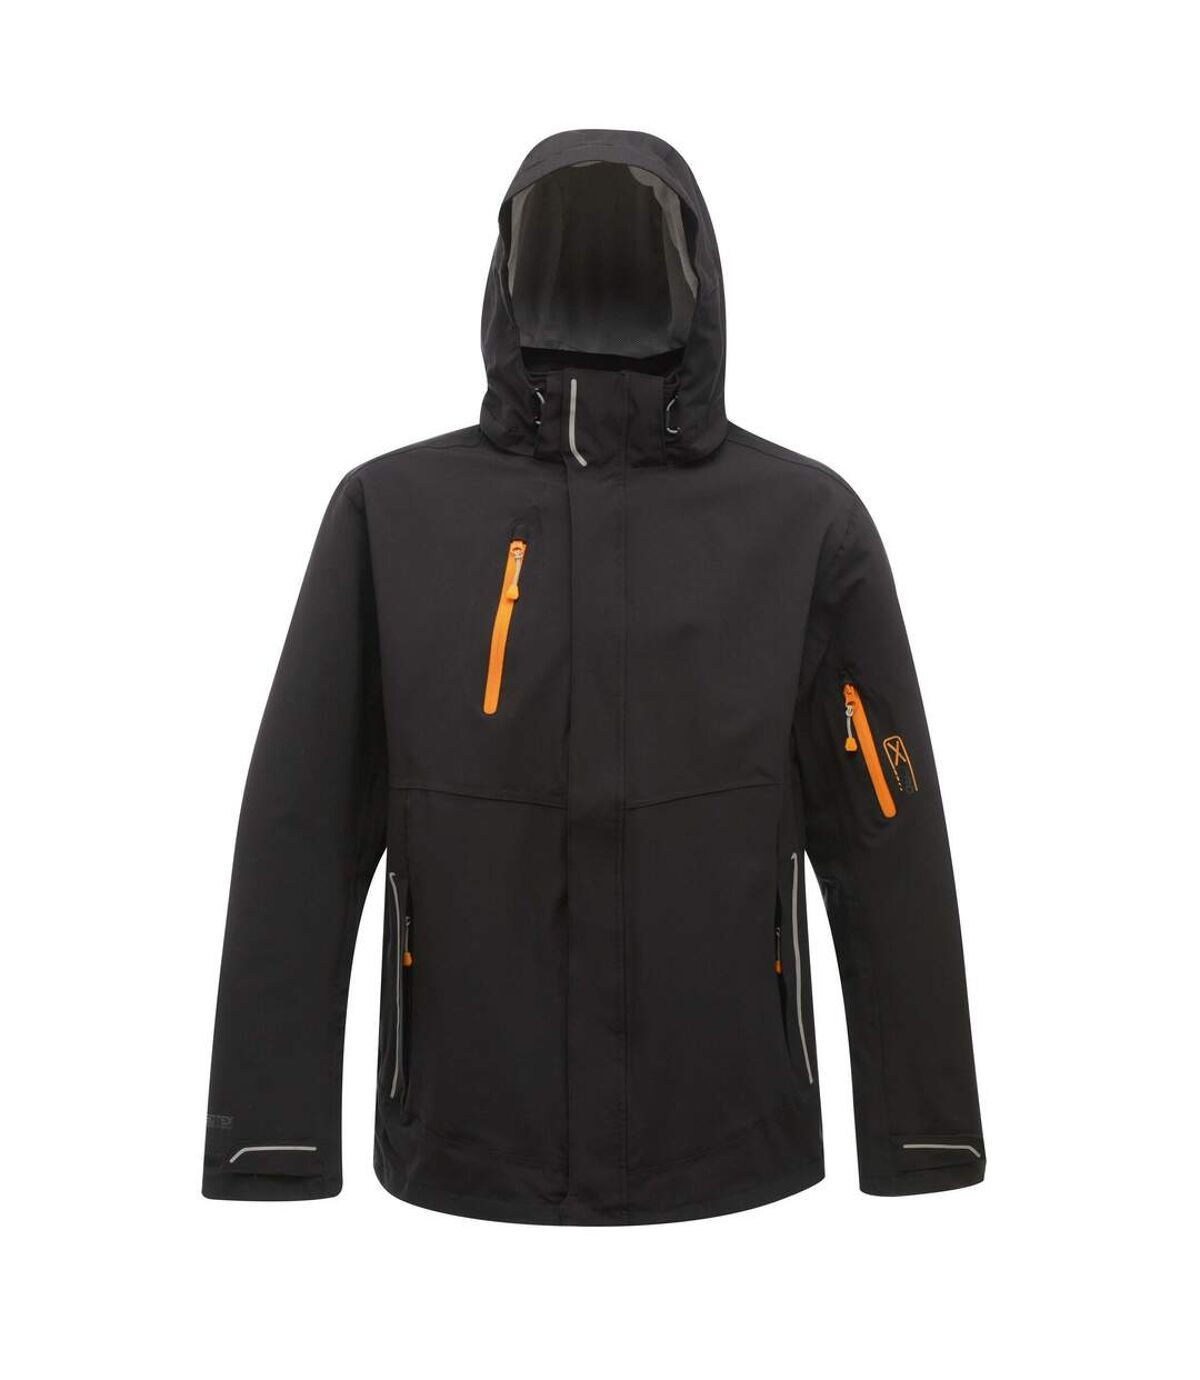 Regatta Mens X-Pro Exosphere Waterproof Stretch Jacket (Black) - UTRG1918